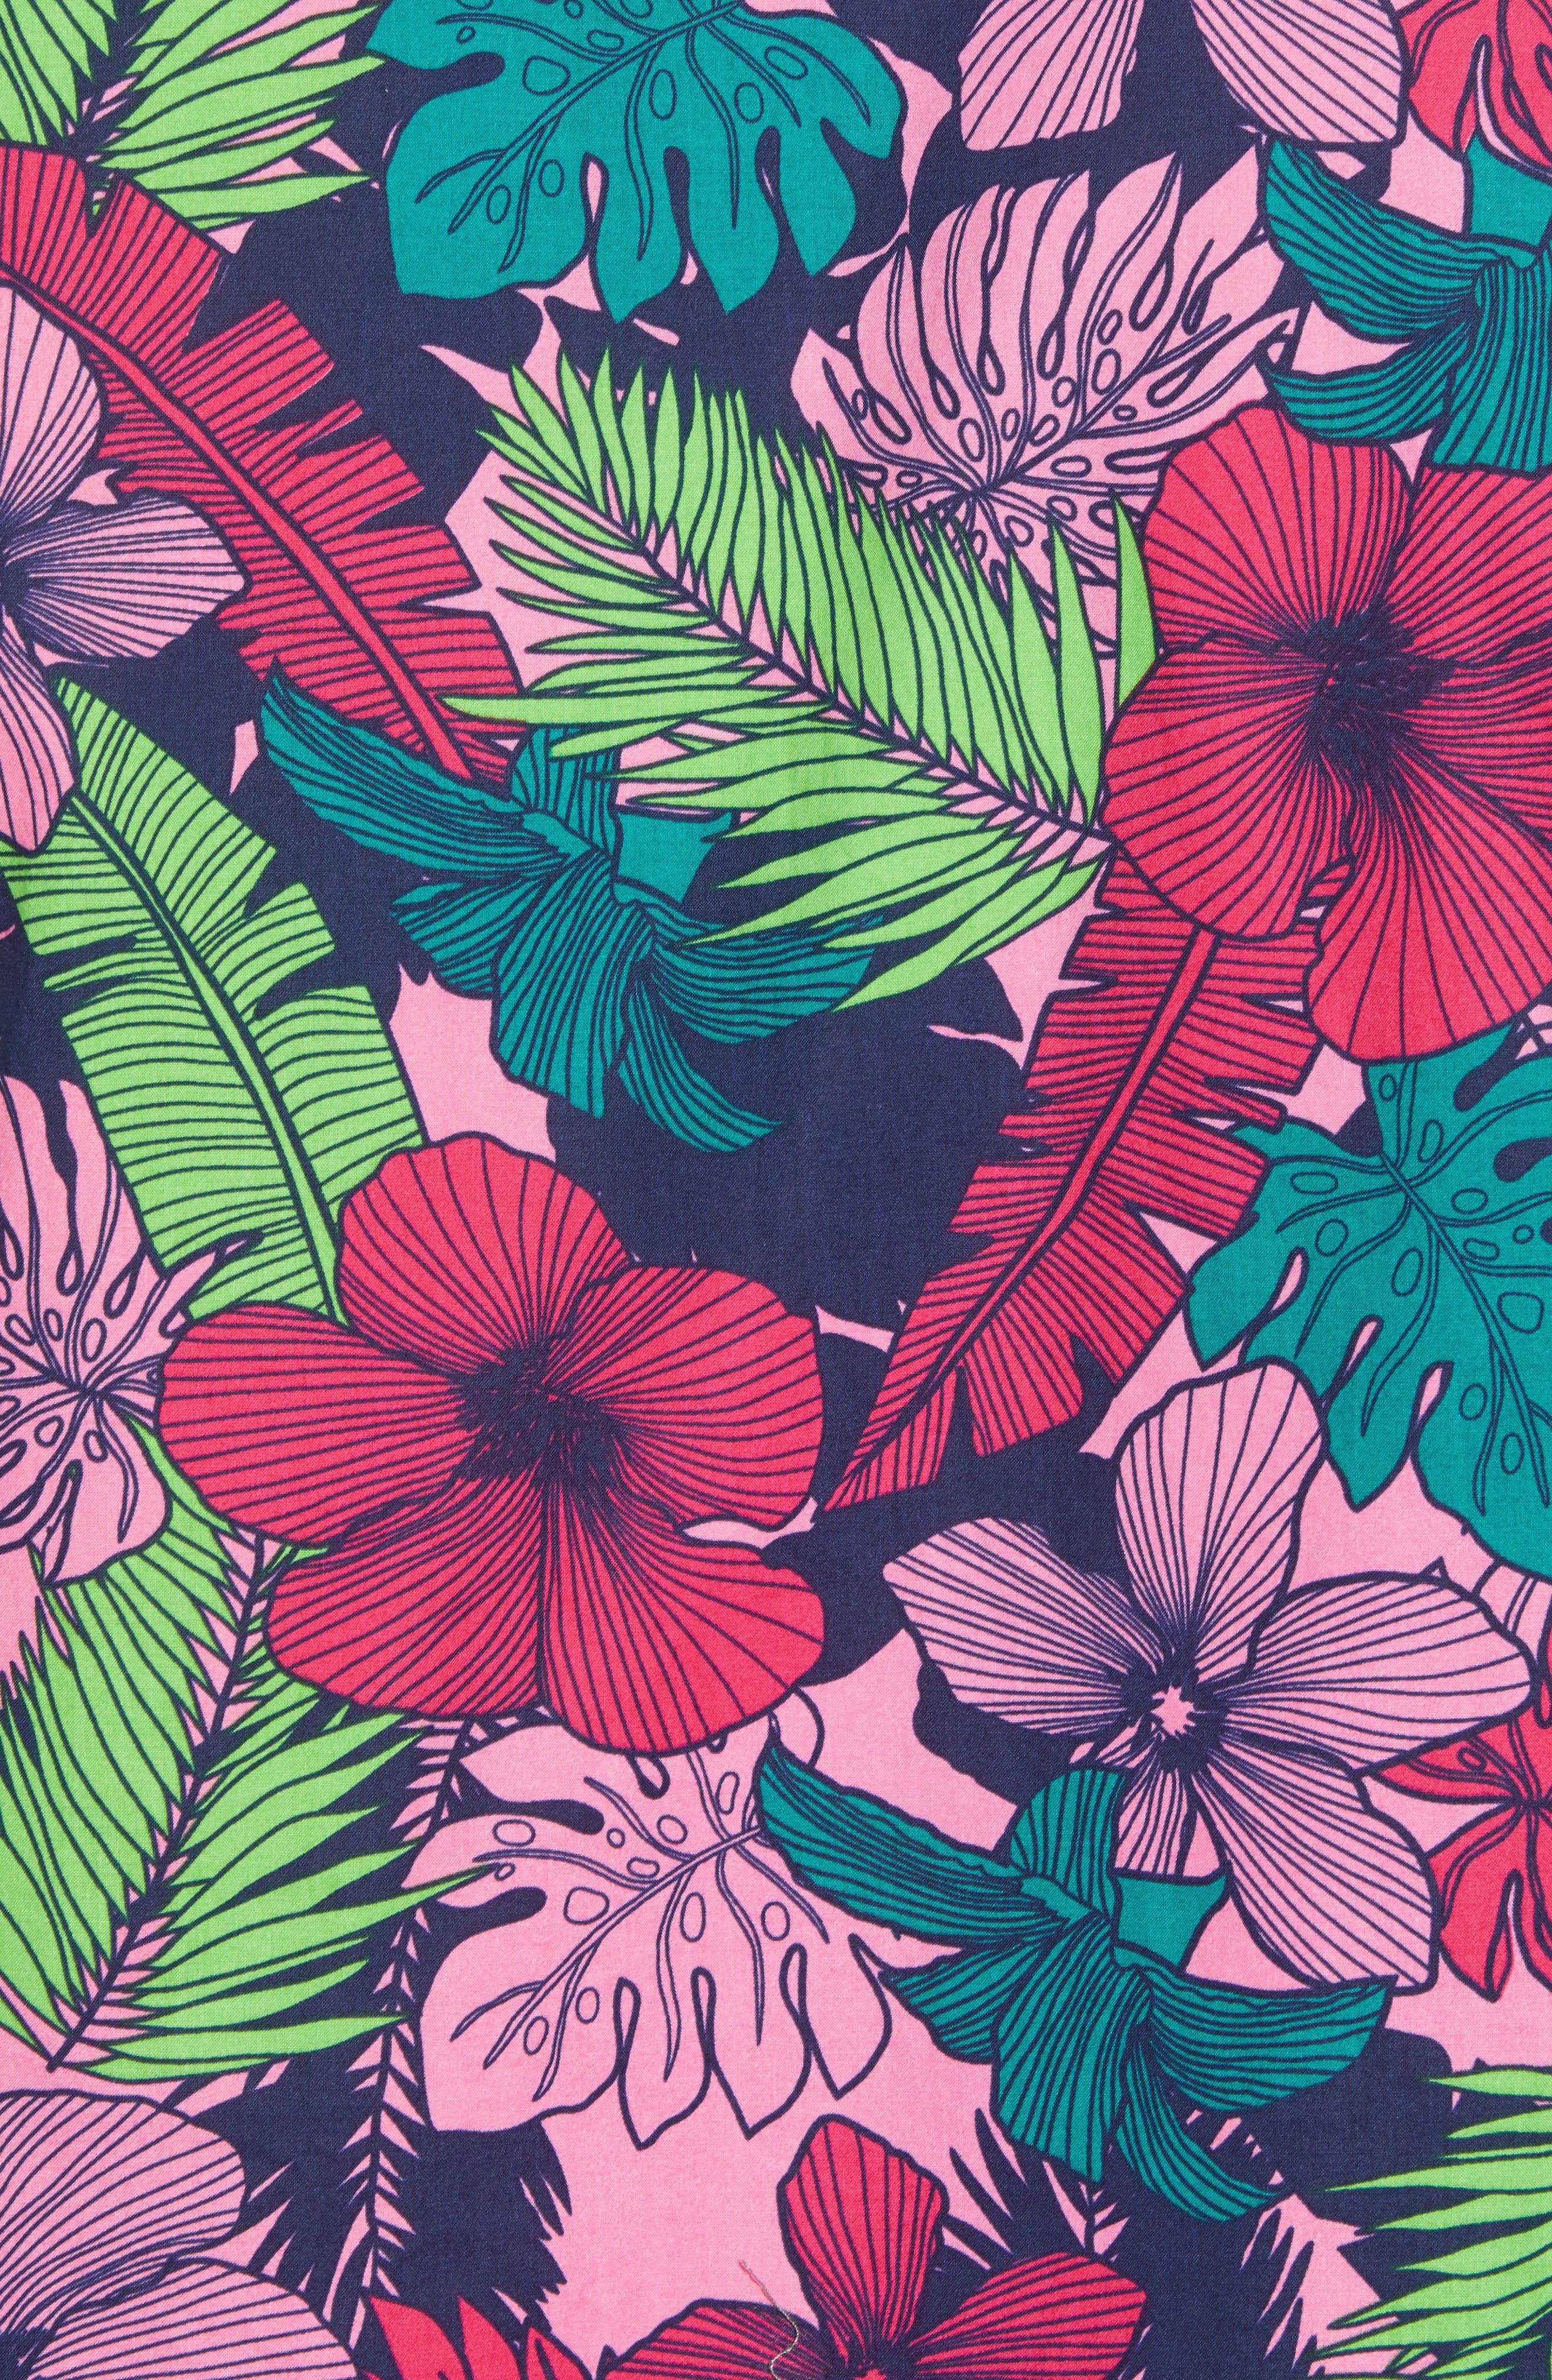 Slim Fit Floral Print Sport Shirt,                             Alternate thumbnail 5, color,                             Garden Cove - Pink Rocket